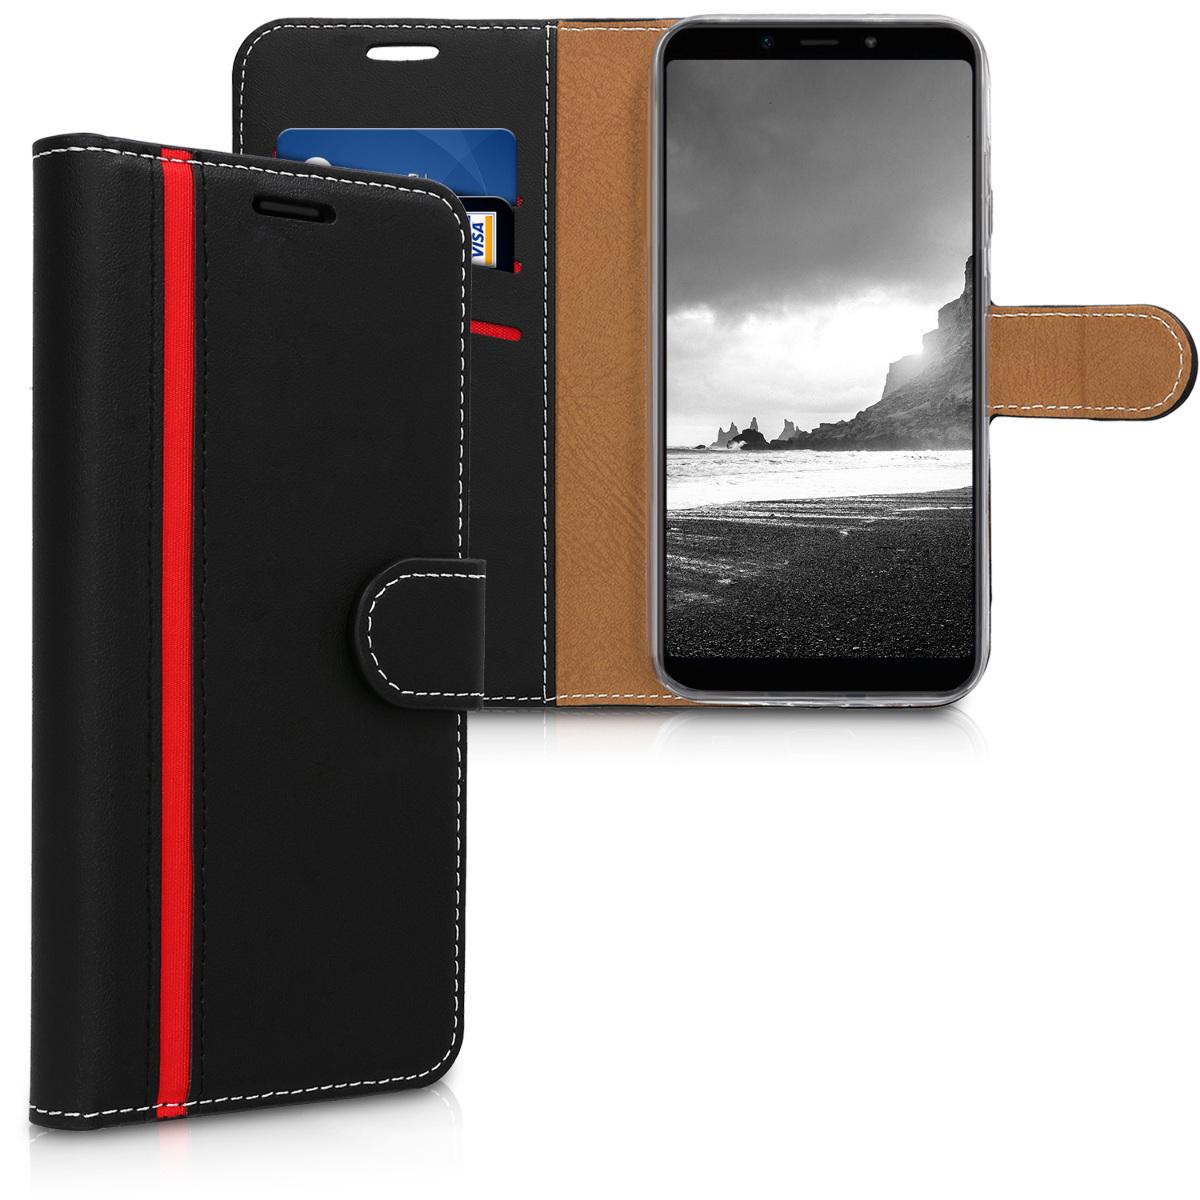 KW Θήκη - Πορτοφόλι Xiaomi Mi A2 Lite / Redmi 6 Pro - Black / Tan with Red Line (46367.01)